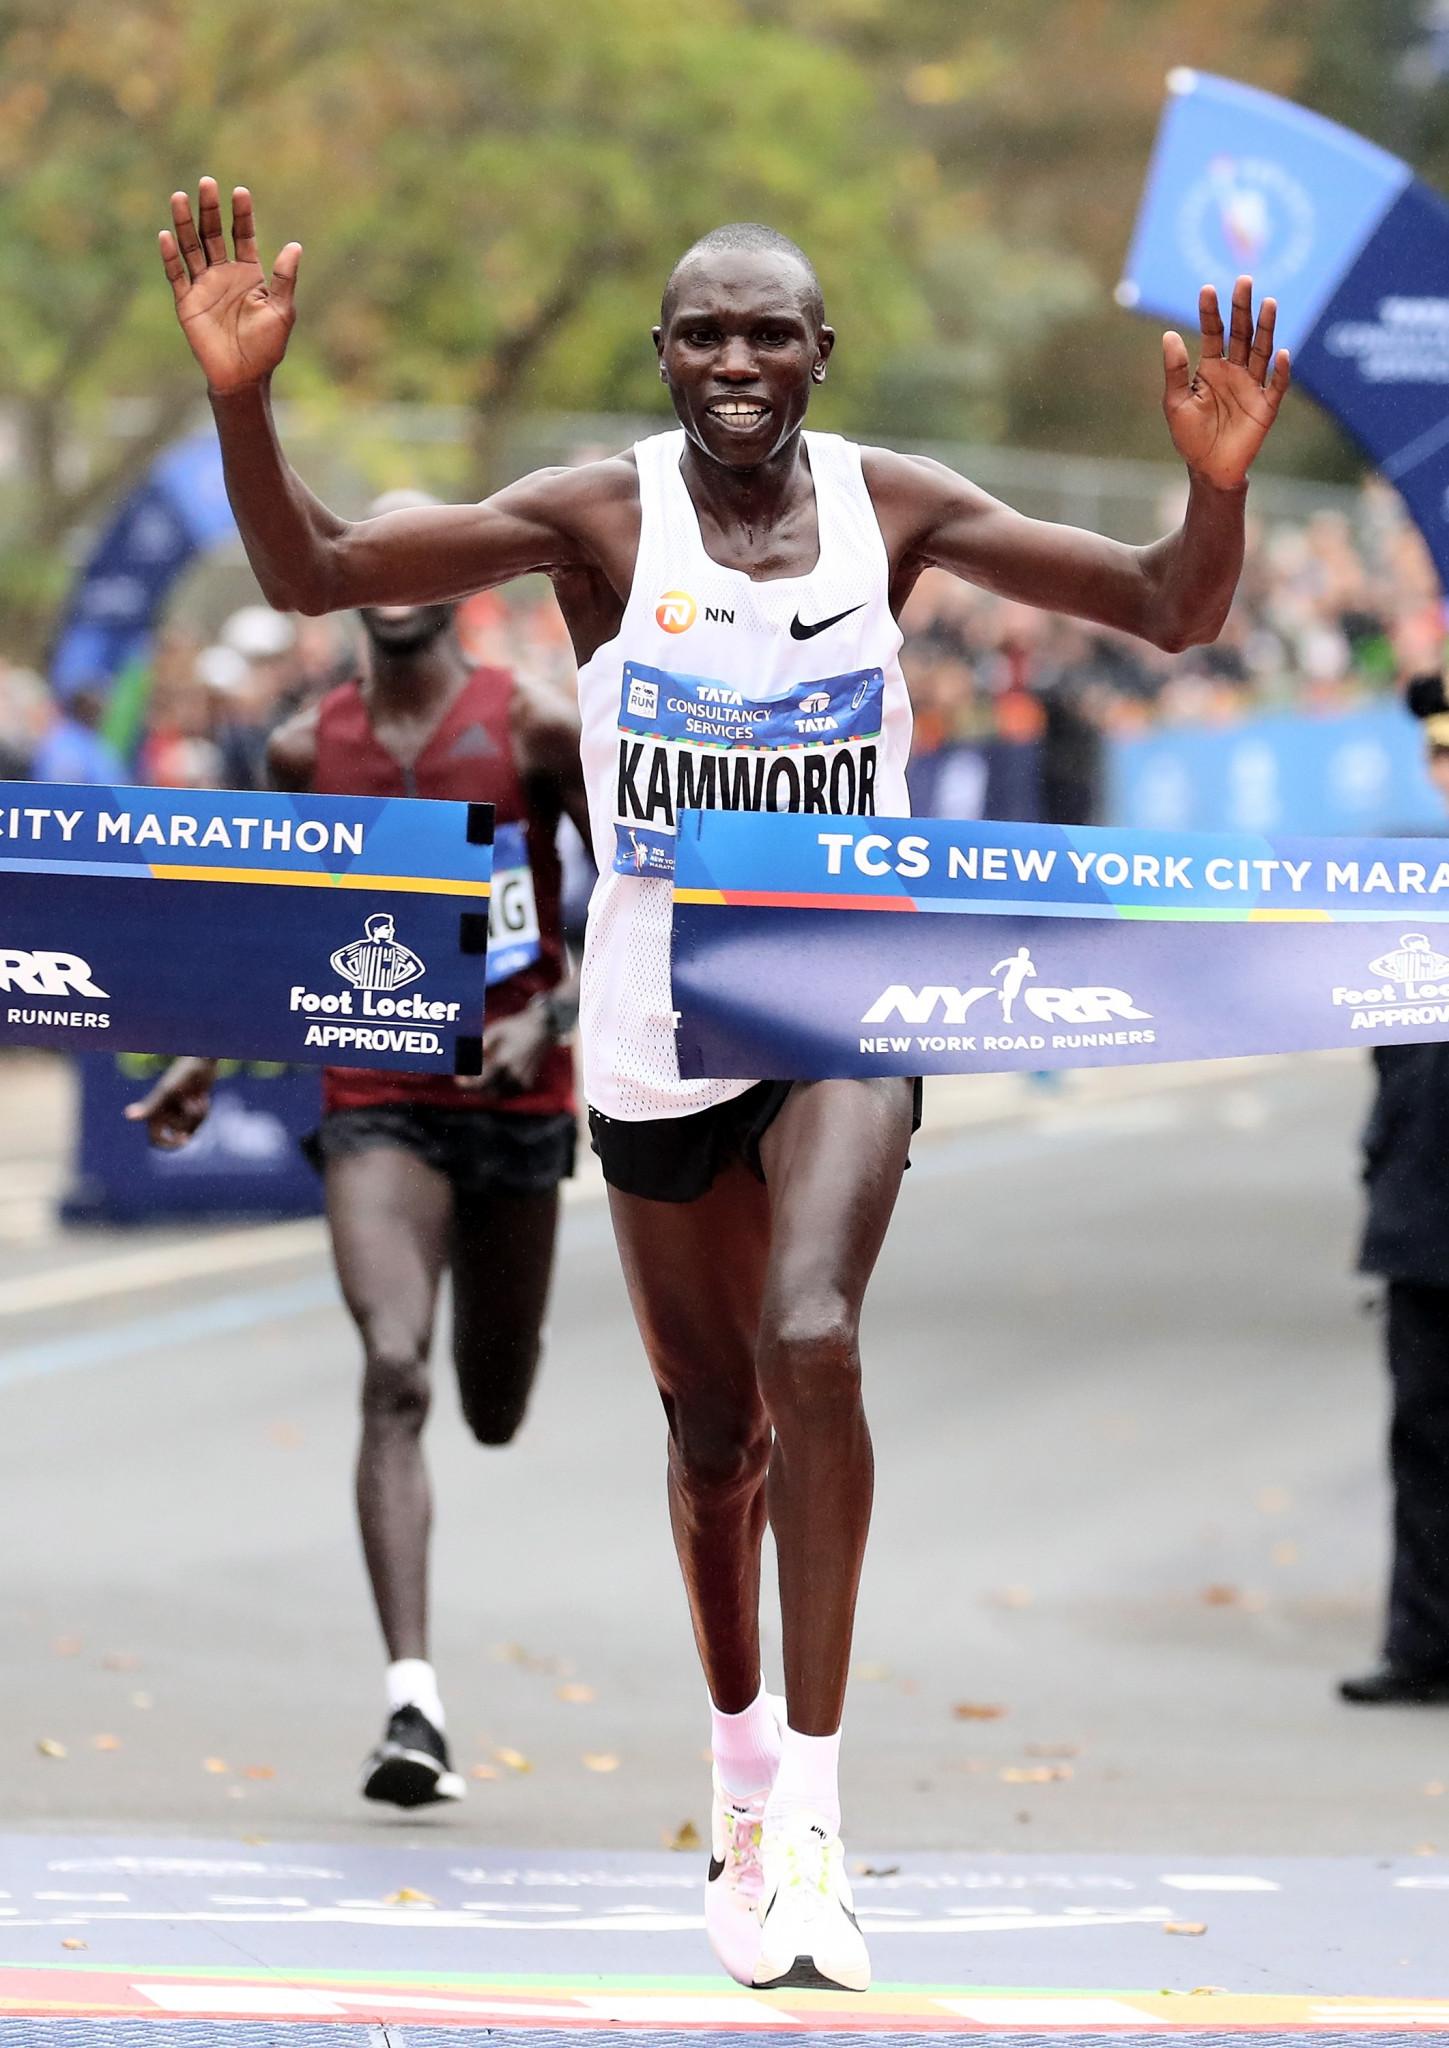 Geoffrey Kamworor triumphed at last year's New York City Marathon ©Getty Images